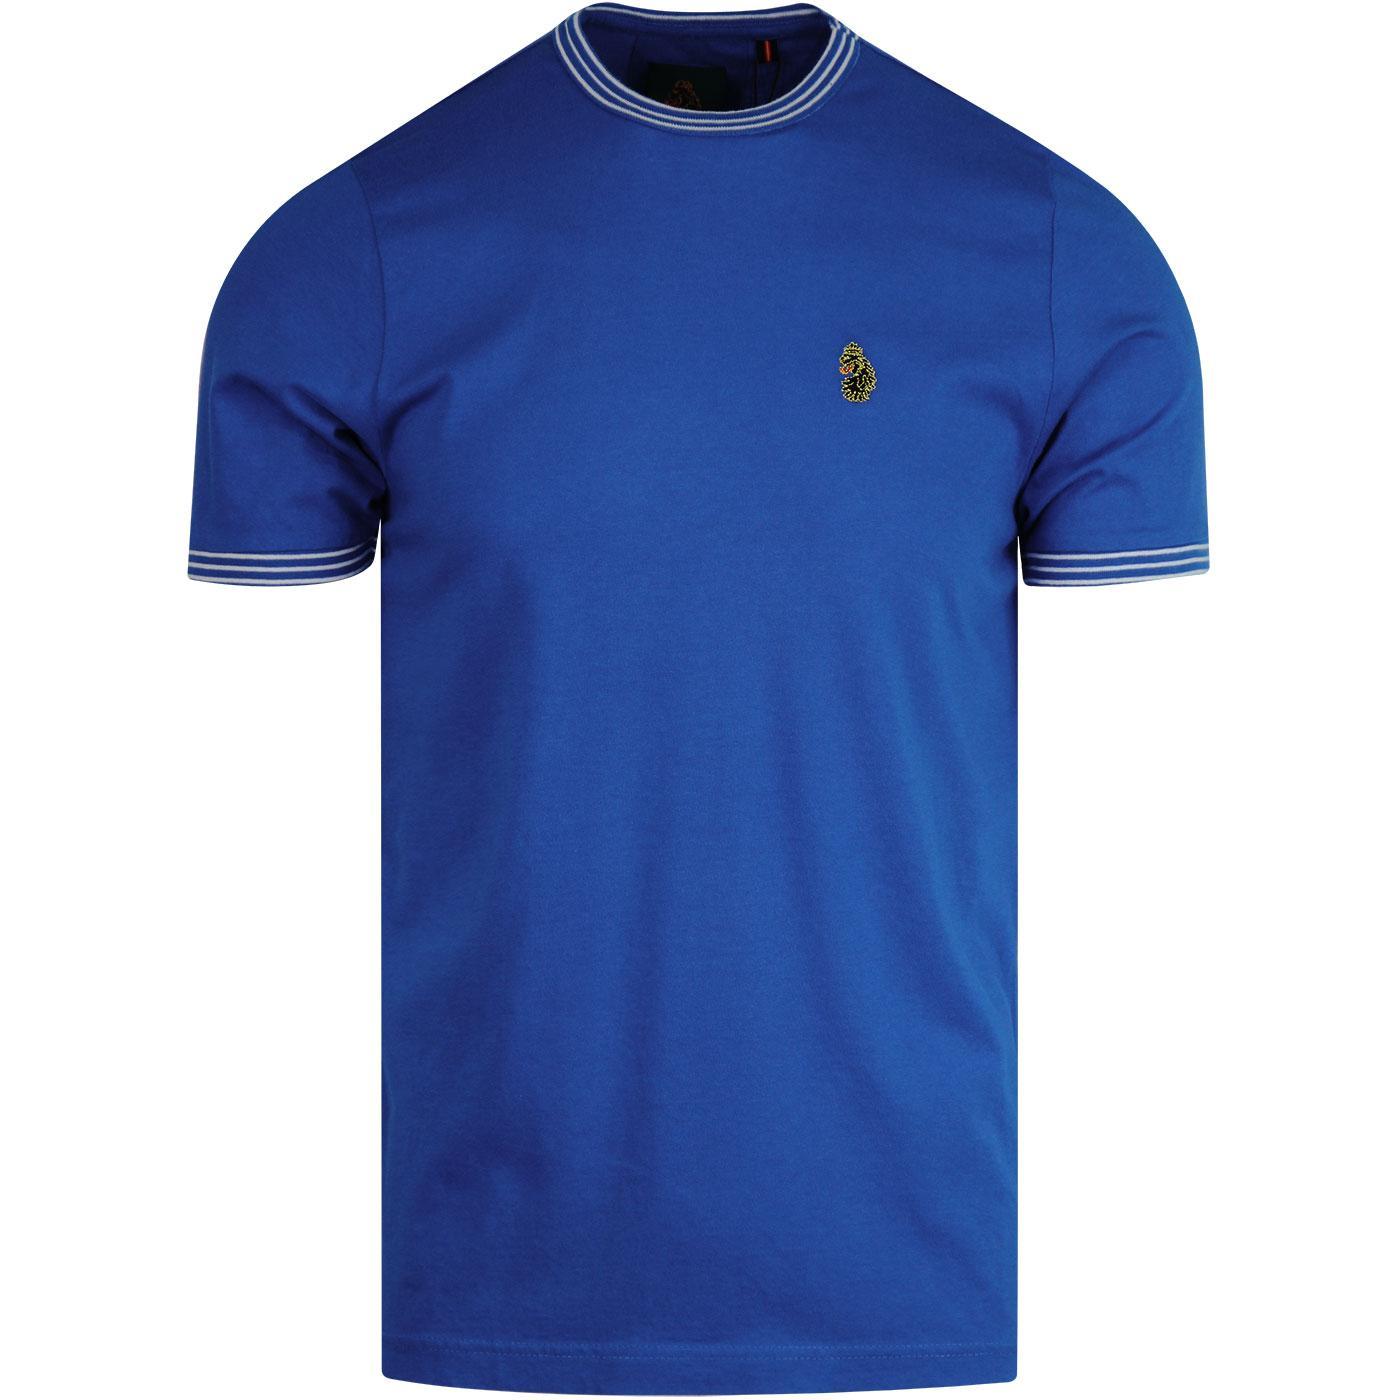 Traff 2 LUKE 1977 Crew Neck Sports T-Shirt Cobalt